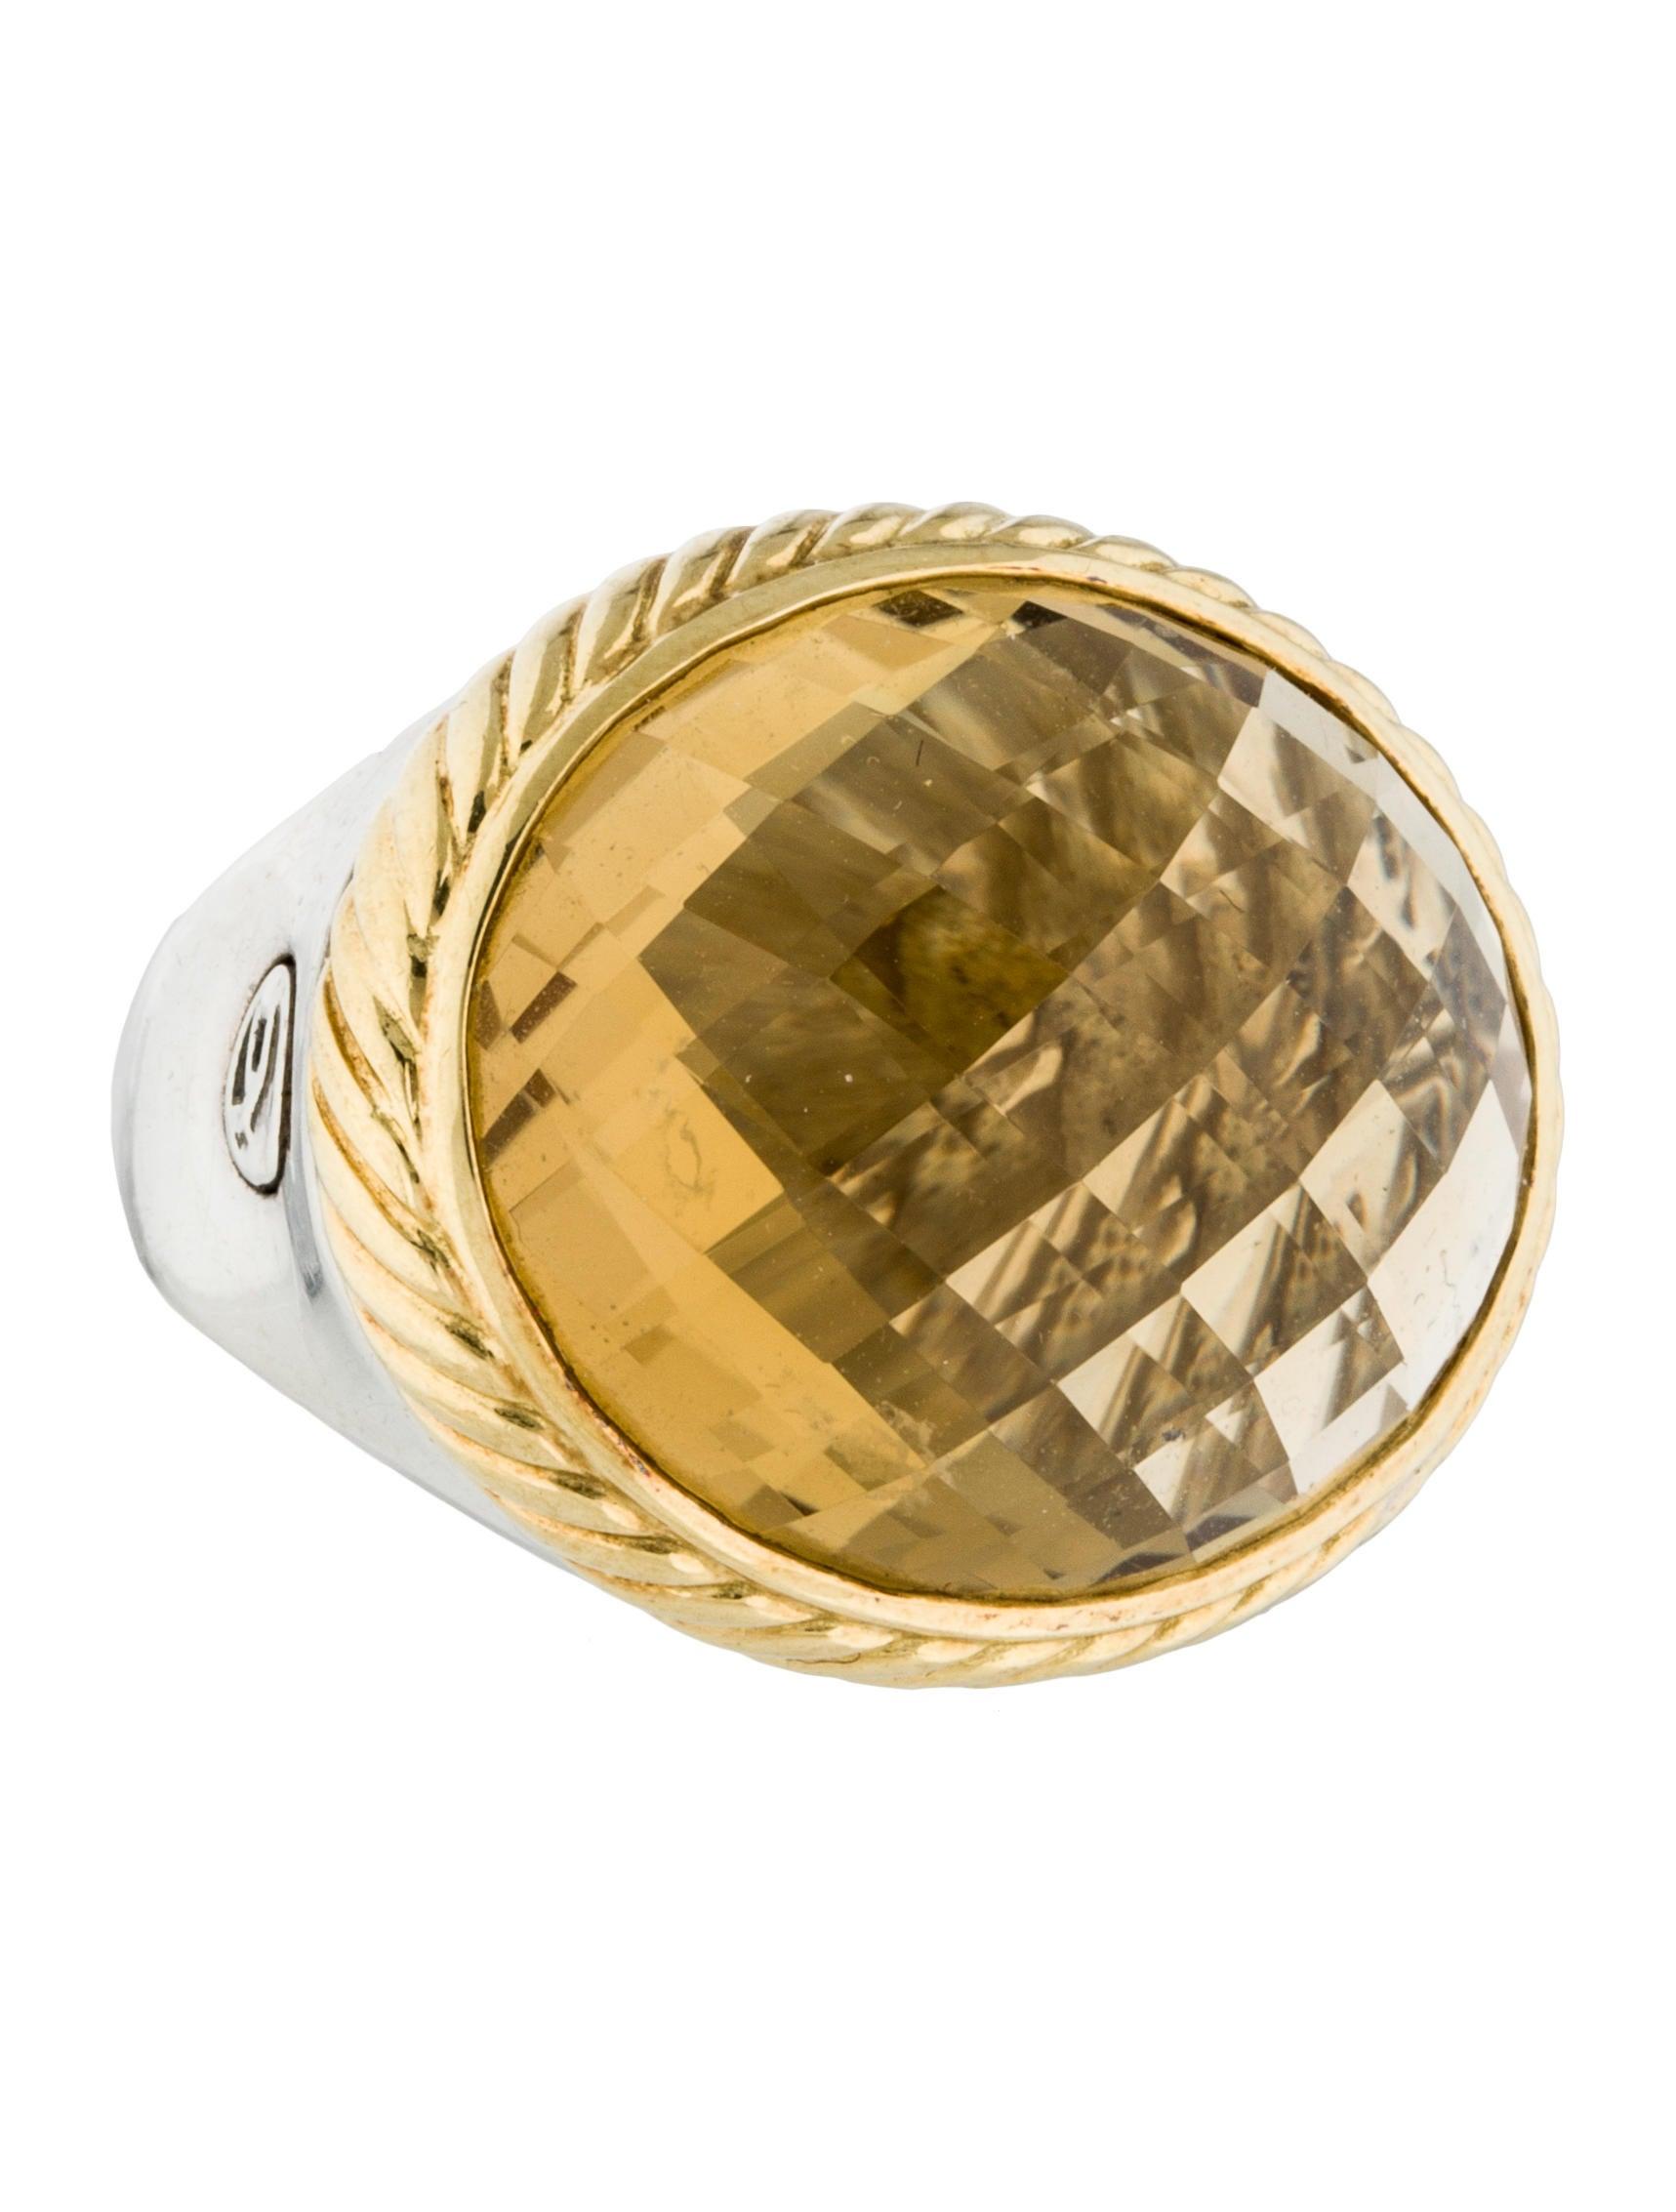 David yurman citrine oval ring rings dvy34744 the for David yurman inspired jewelry rings